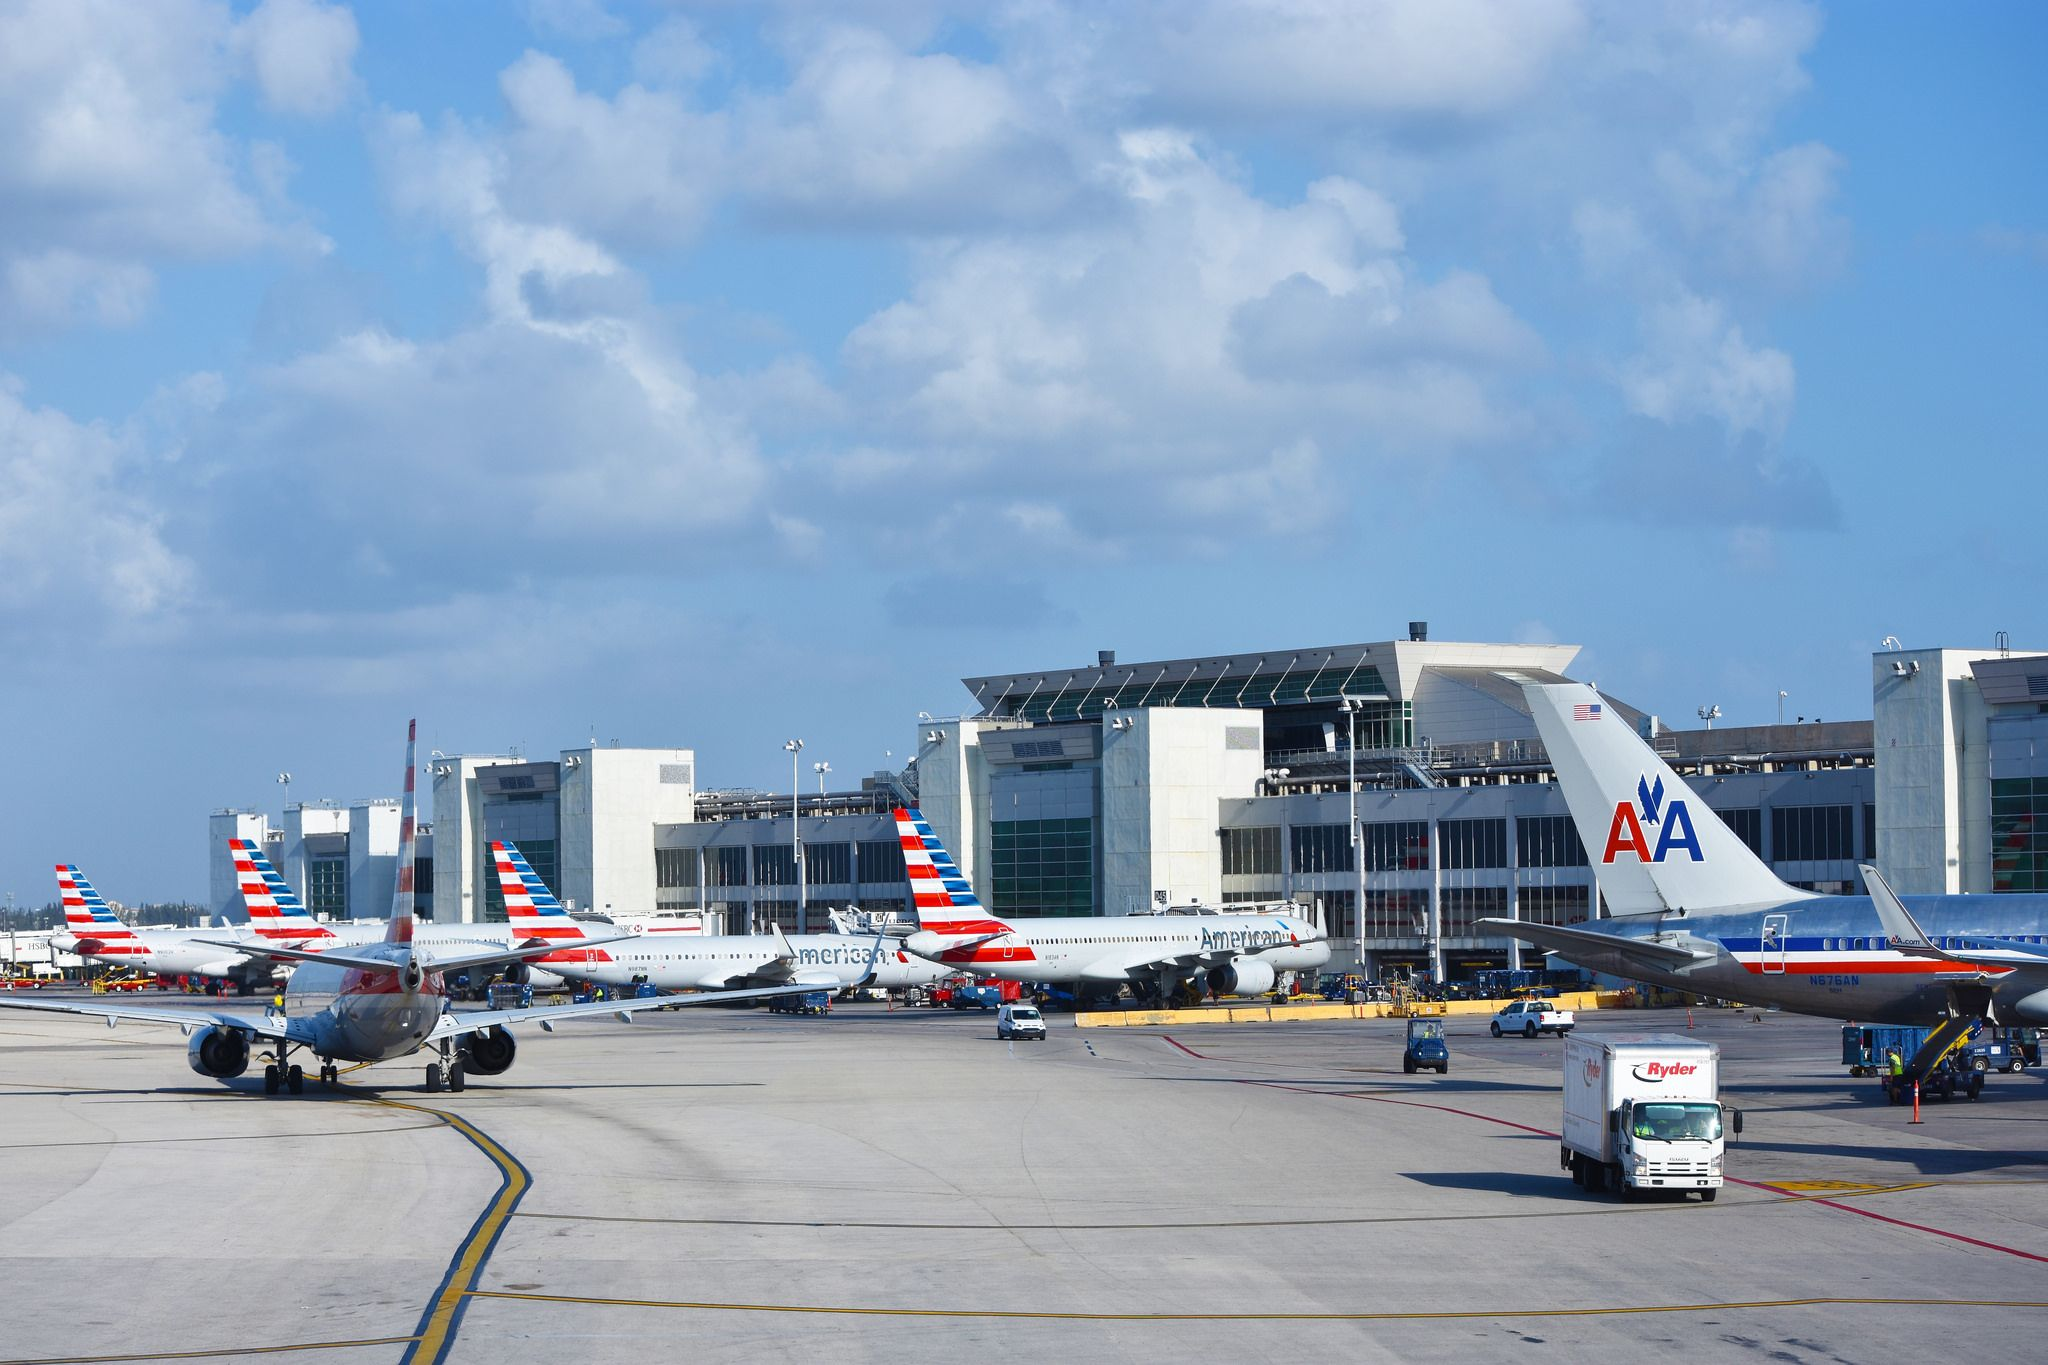 https://flic.kr/p/UXF576 | American Airlines @ Miami | Miami International Airport April 16, 2017